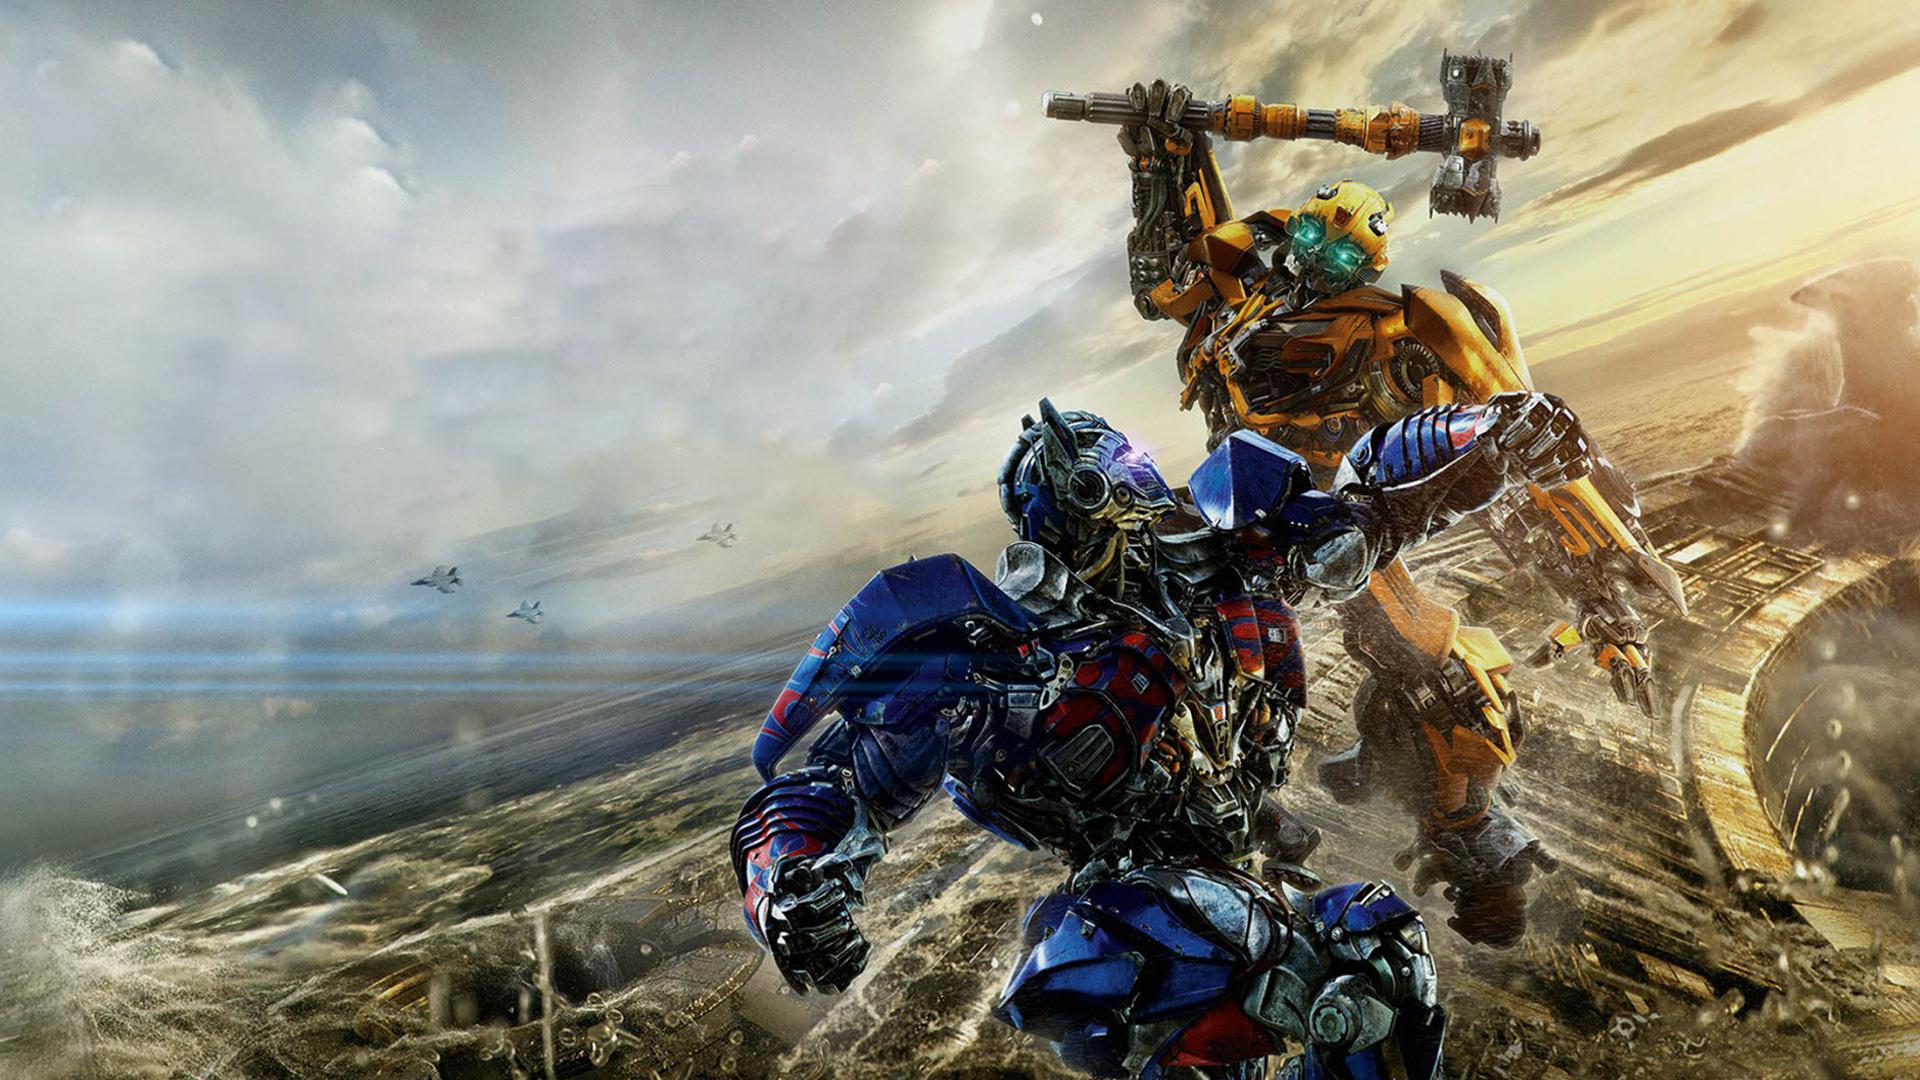 Transformers The Last Knight Premiere Screenings in ...